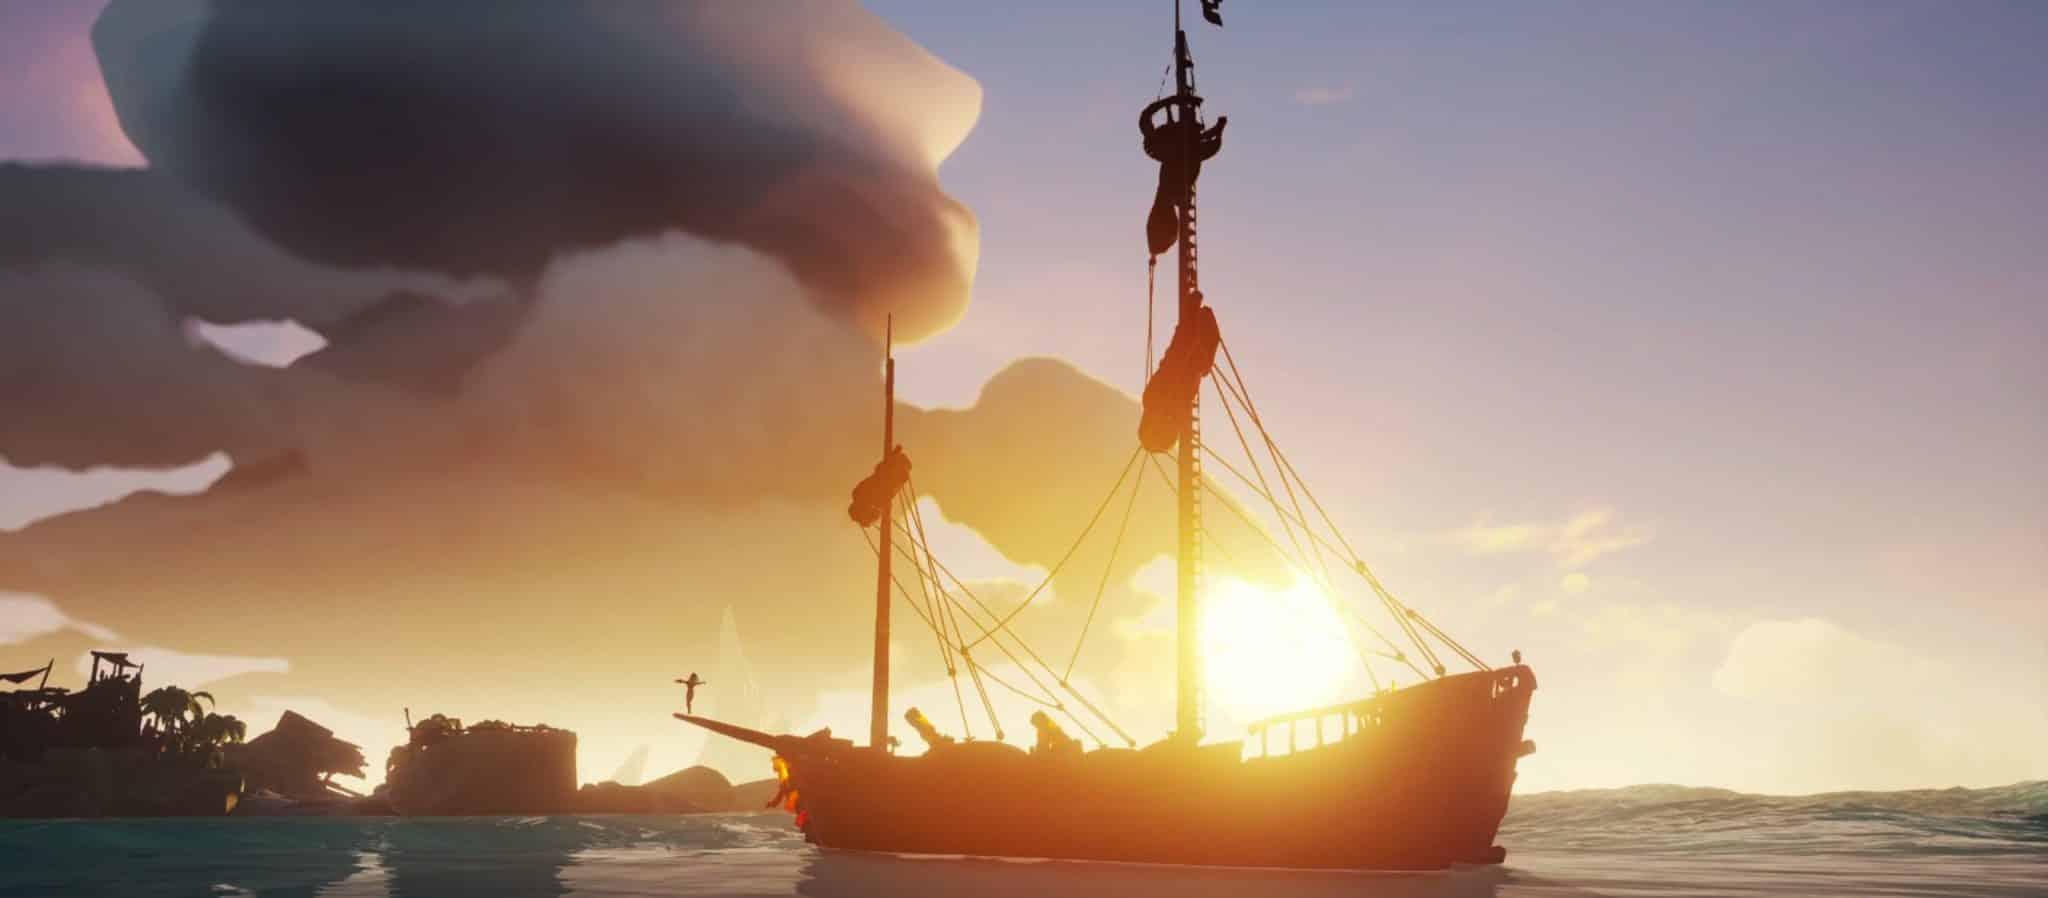 les pirates ont talent